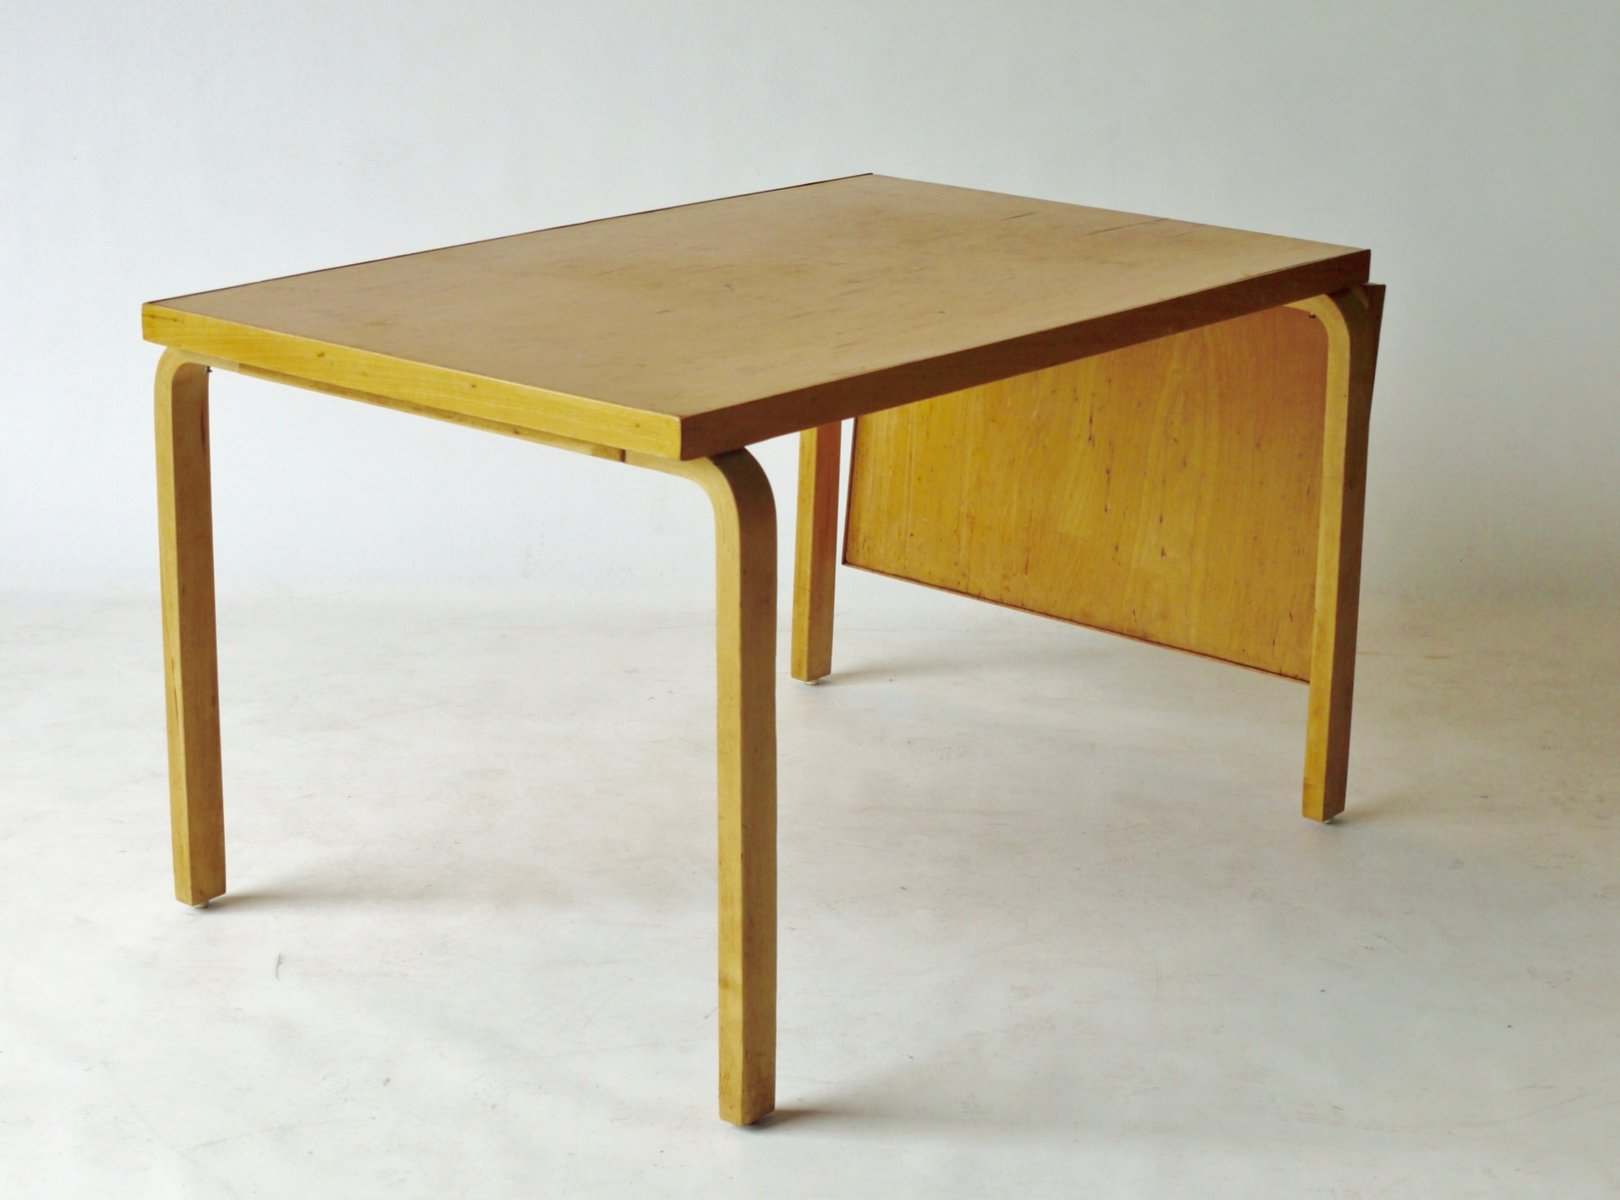 Wonderful Drop Leaf Extendable Dining Table By Alvar Aalto For Artek, 1940s